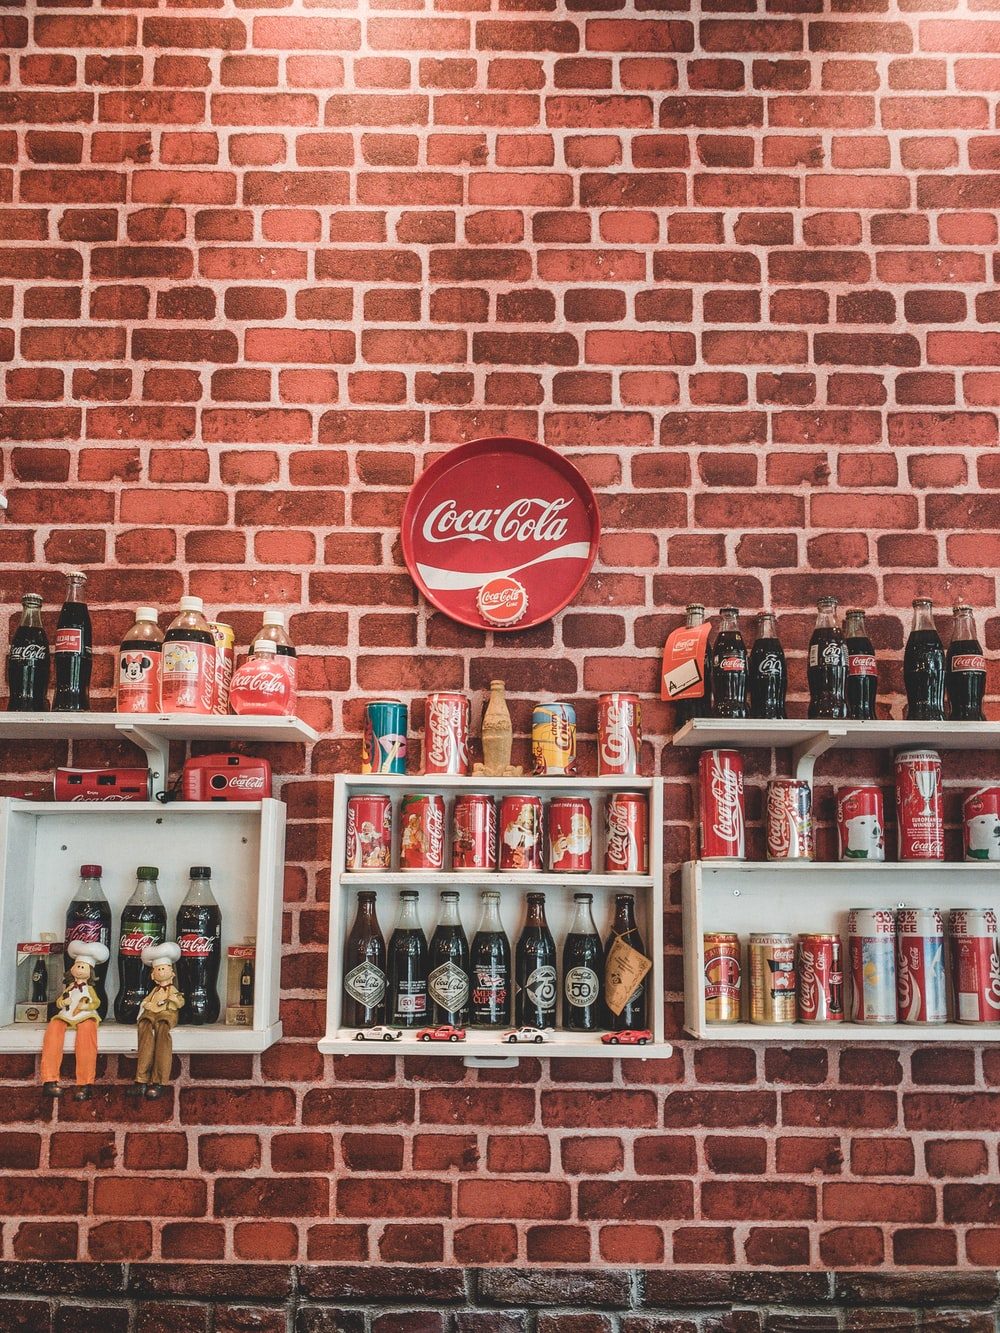 assorted design of Coca-Cola soda lot on display